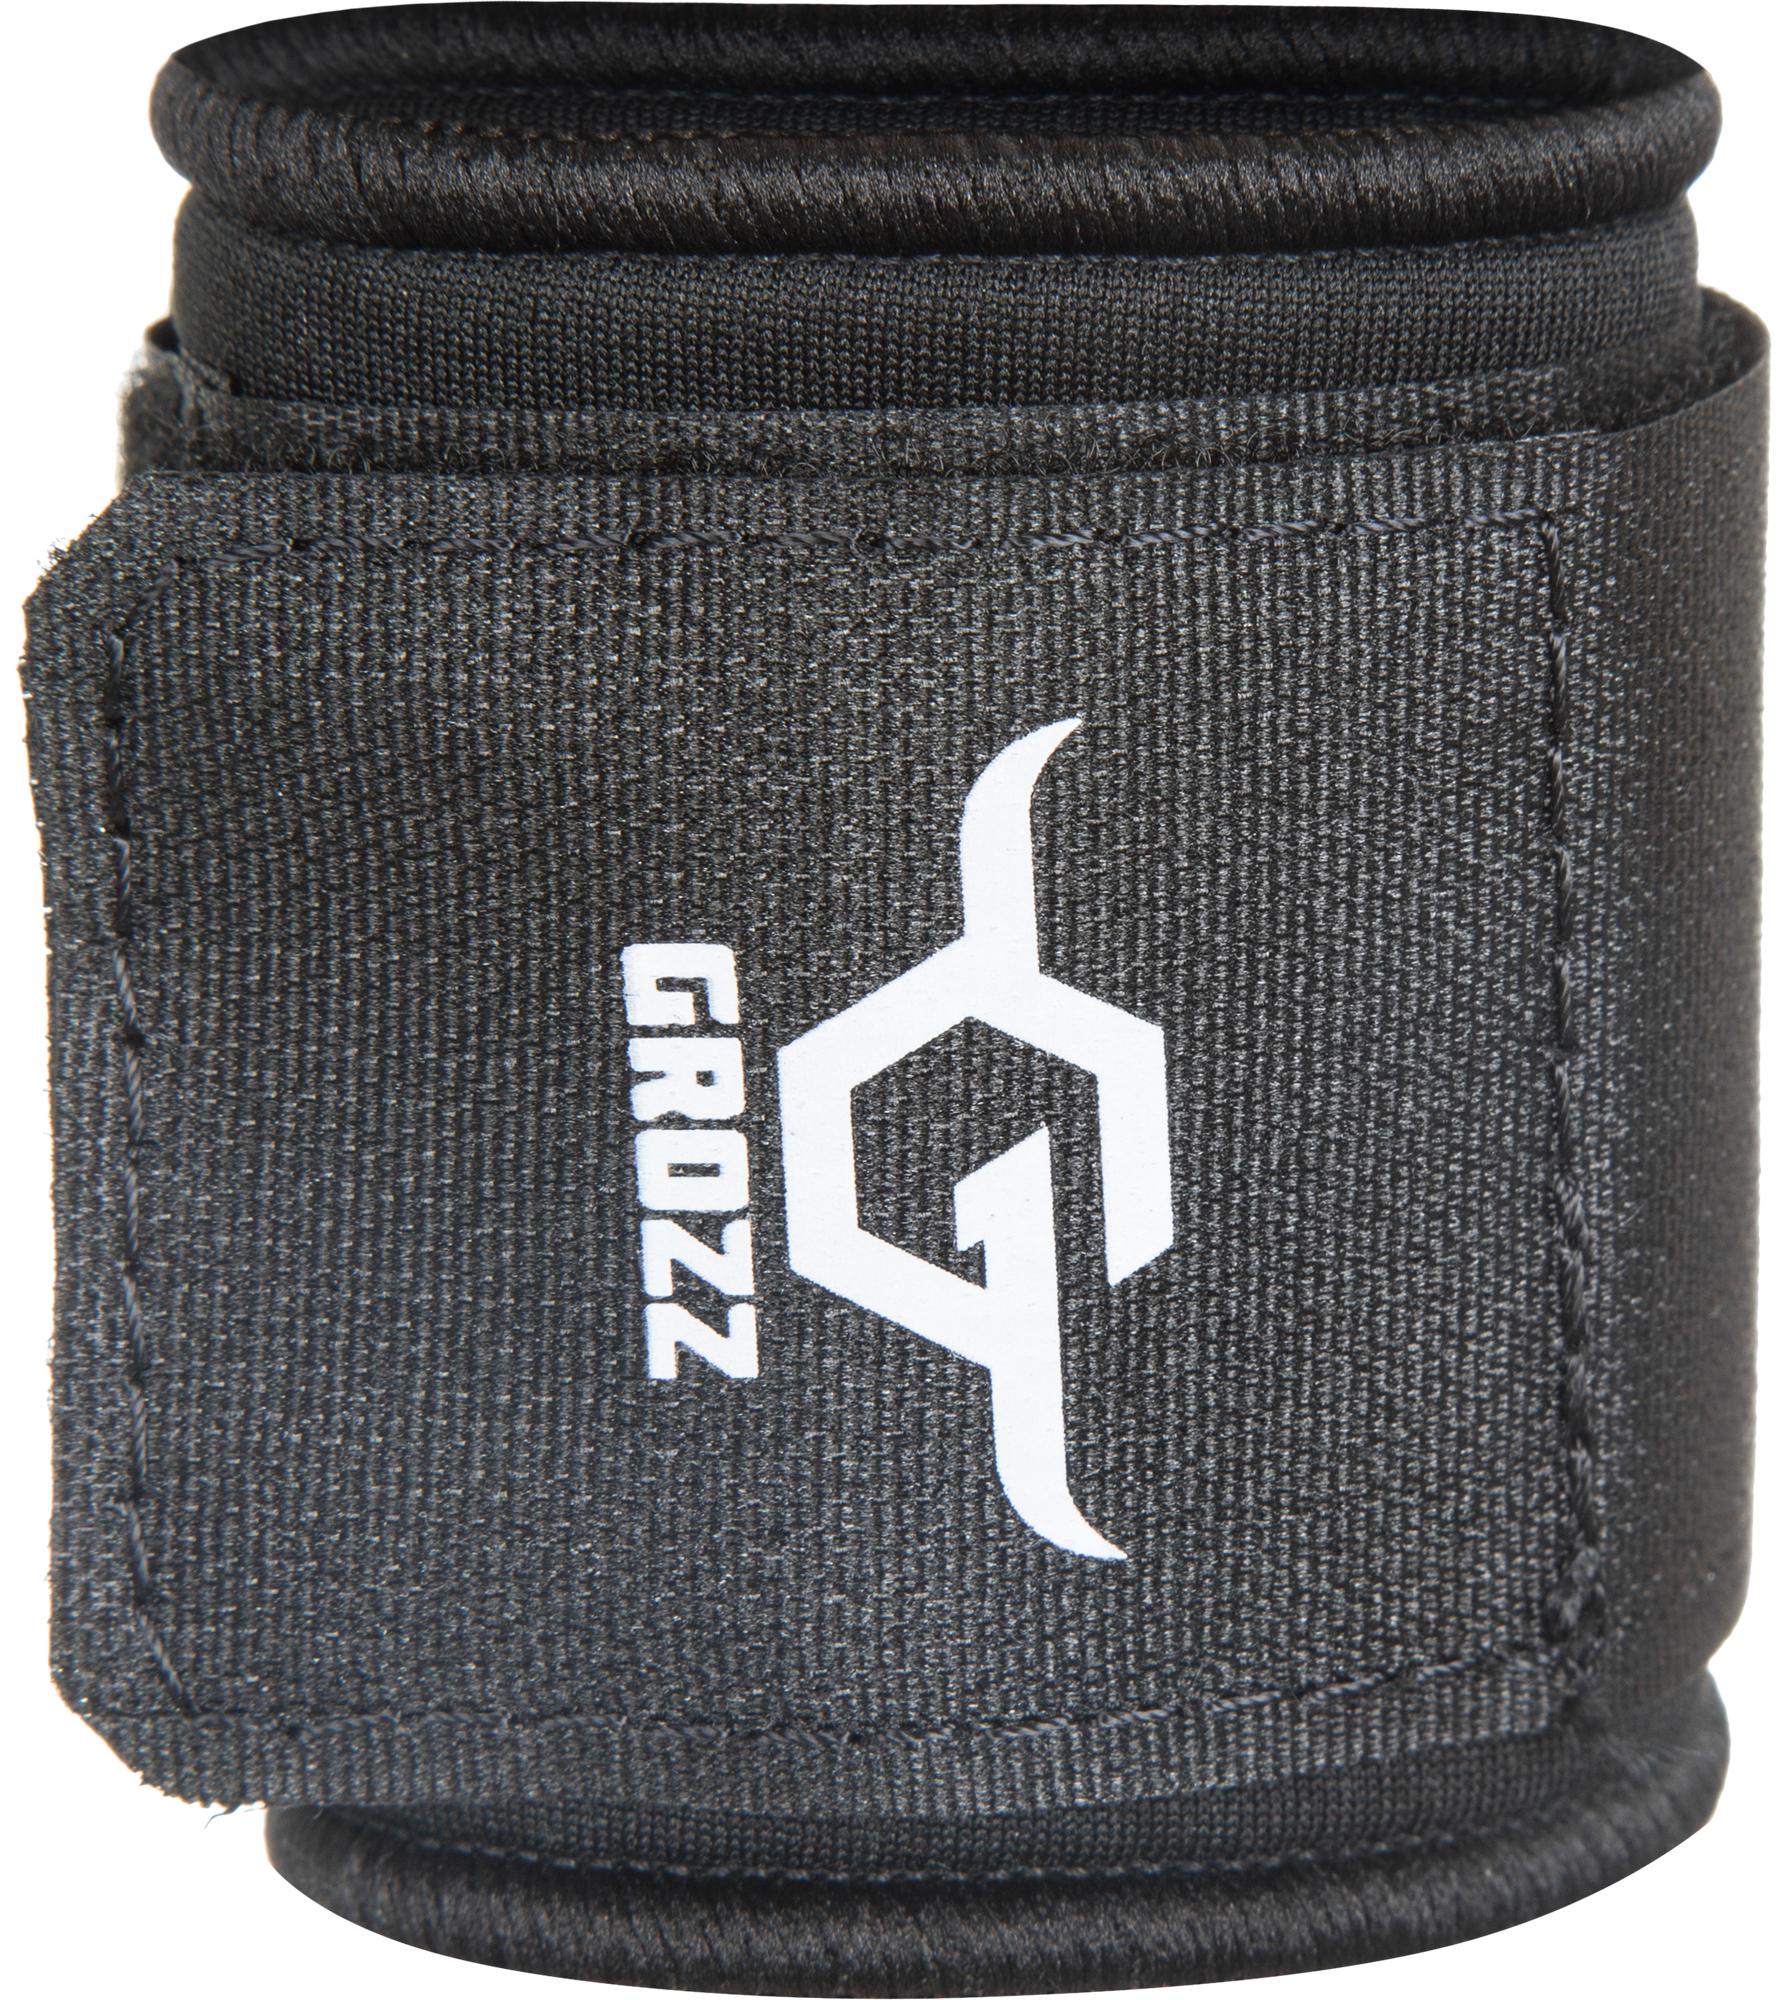 Grozz Суппорт запястья Grozz, размер XL